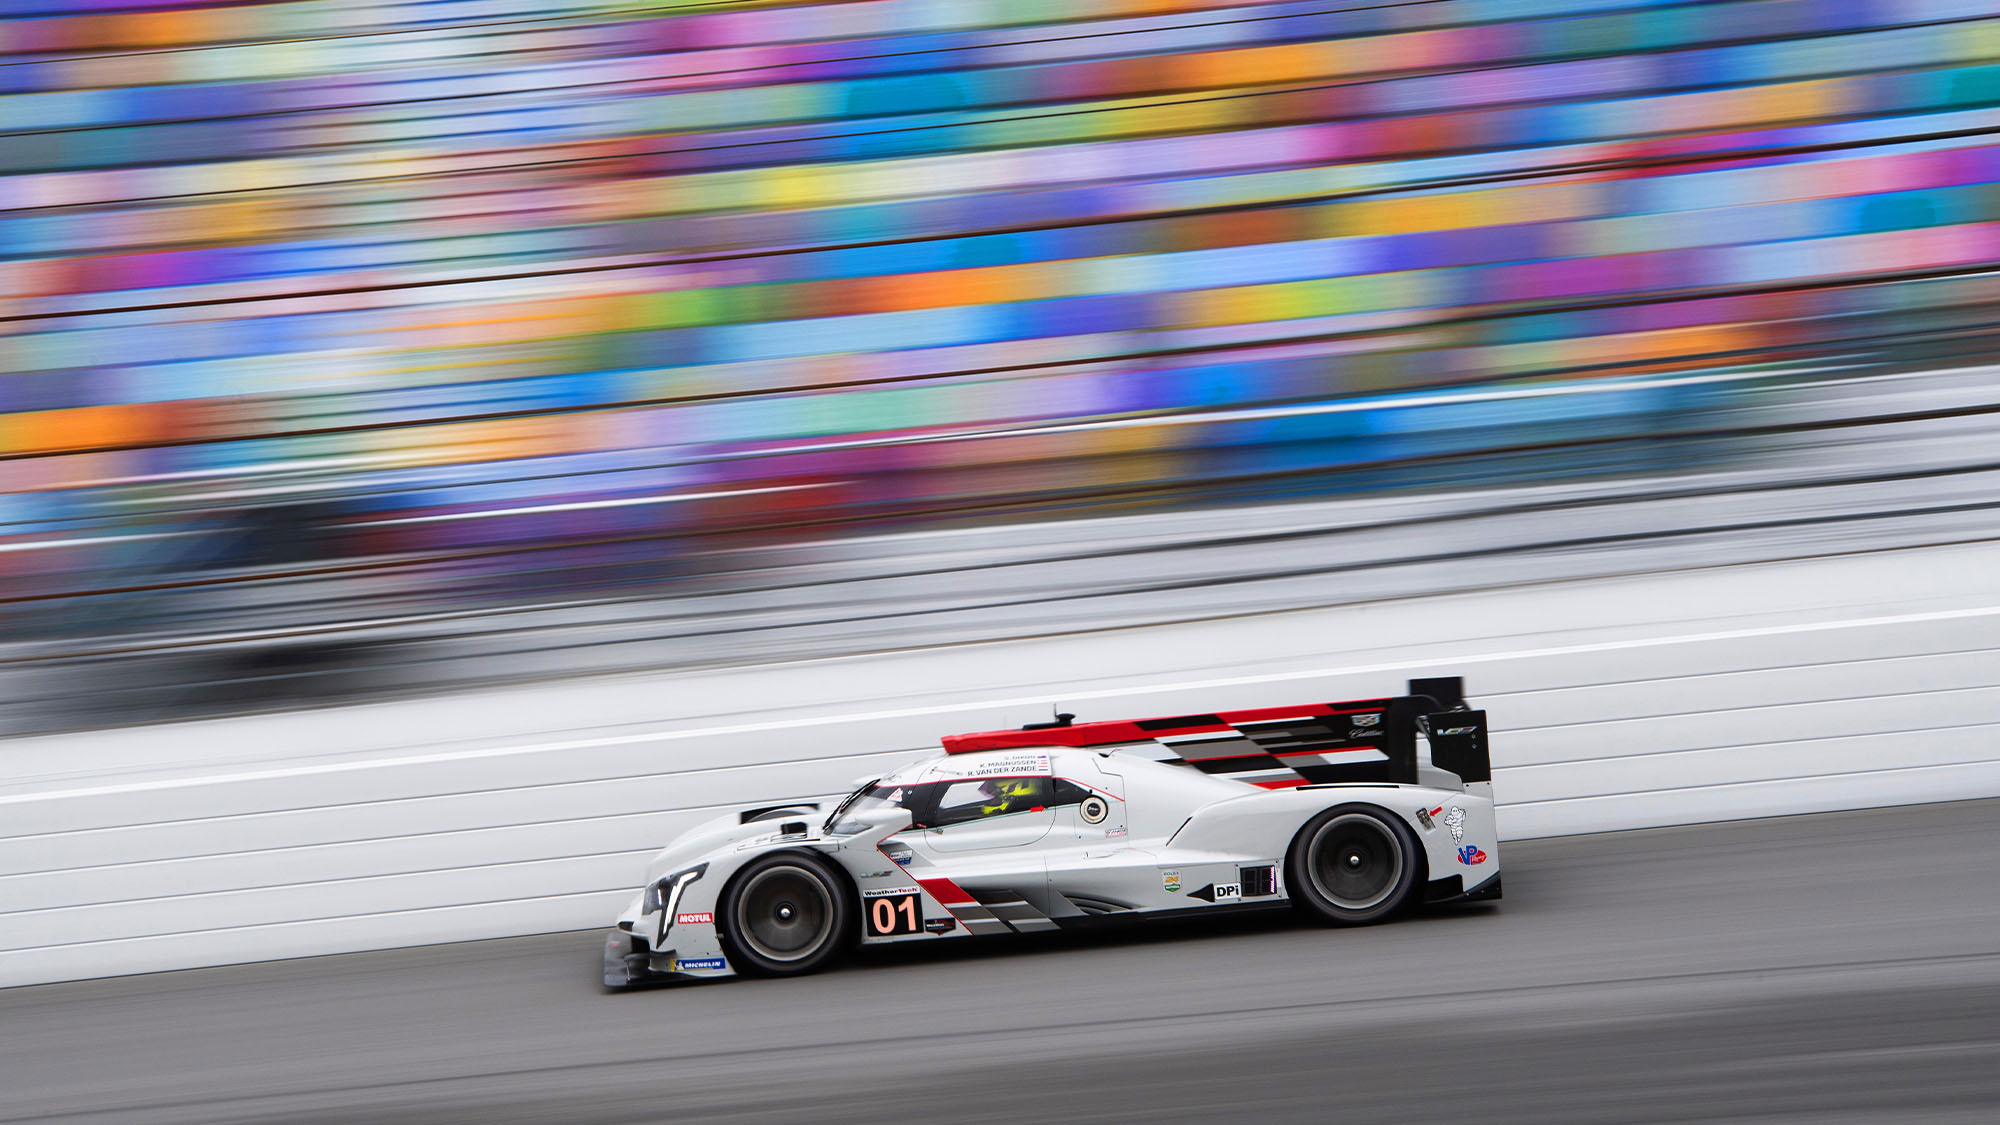 Kevin Magnussen/Renger van der Zande during practice for the 2021 Daytona 24 Hour race. Photo: Jamey Price/Grand Prix Photo